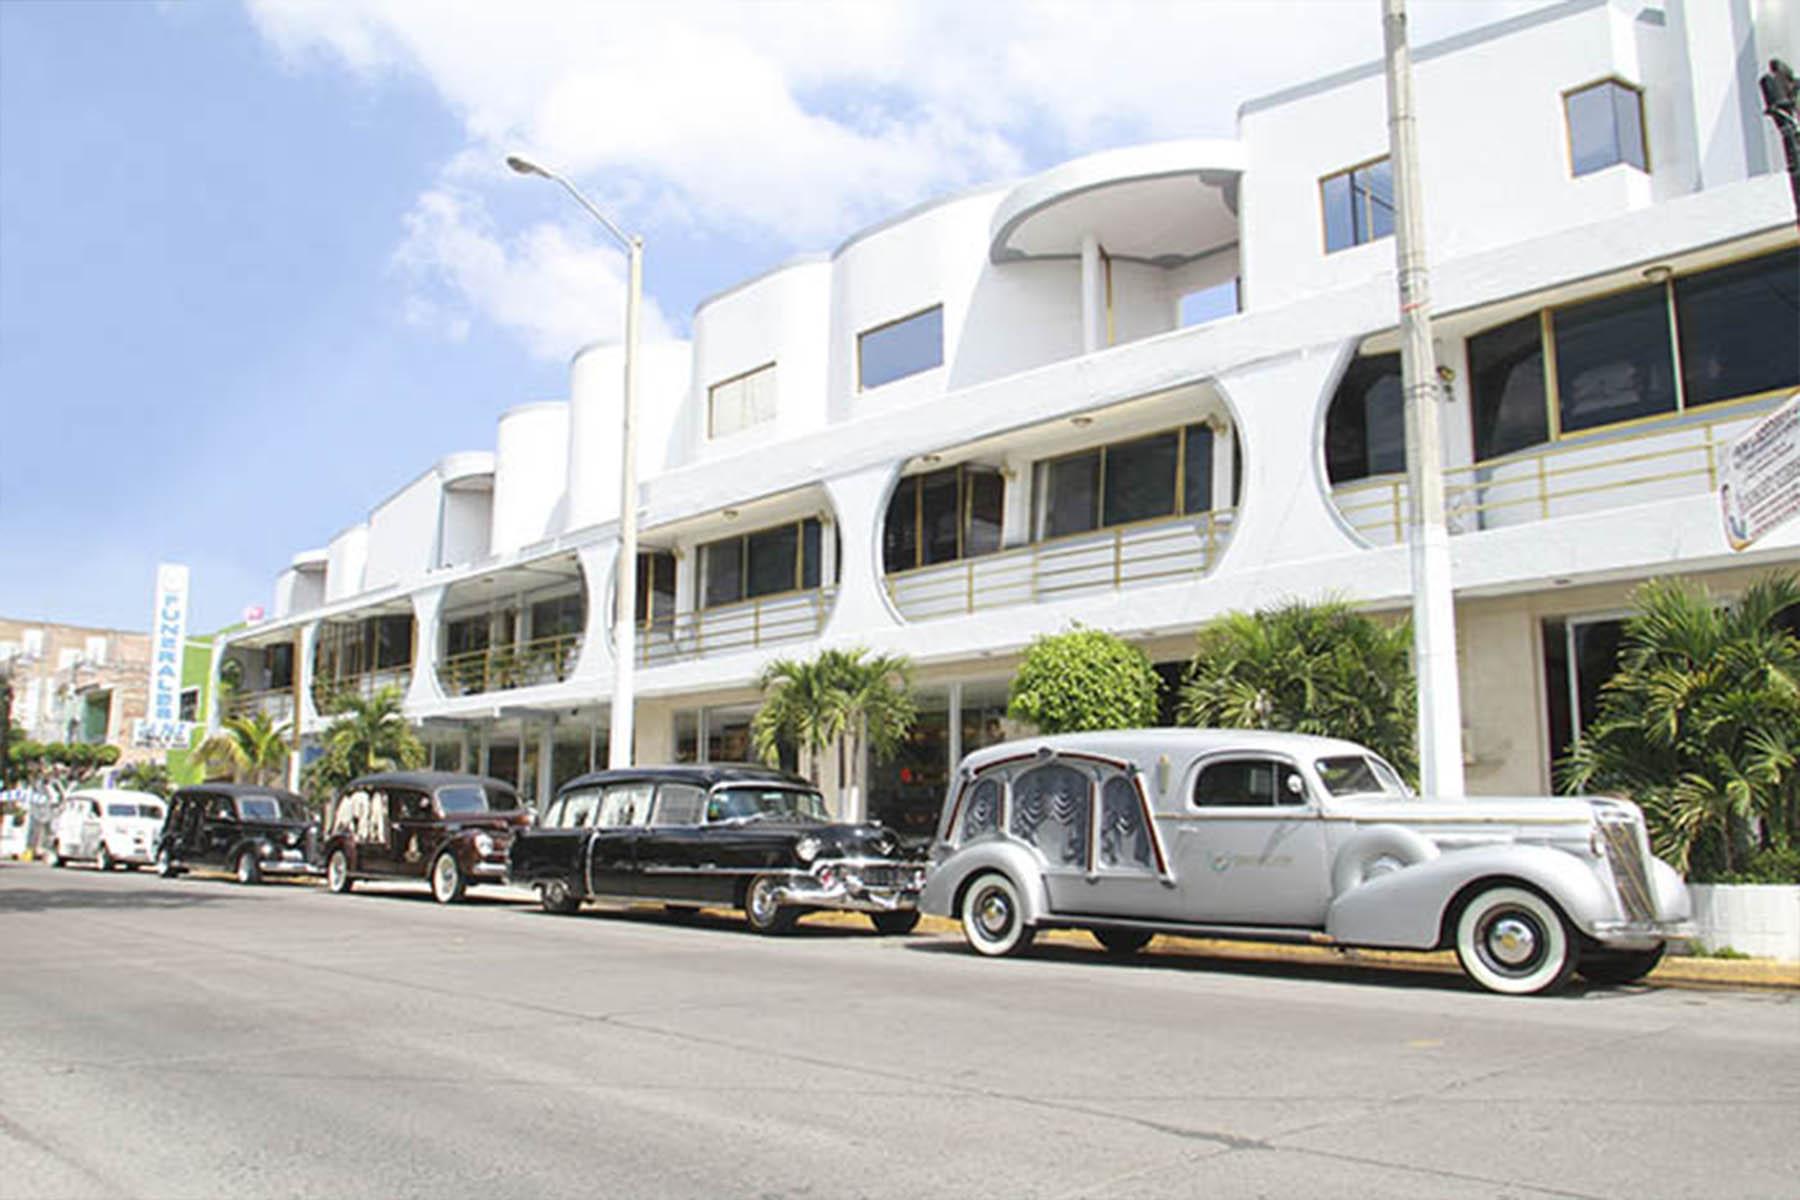 Funerarias  guadalajara  funerales de la paz  fachada principal